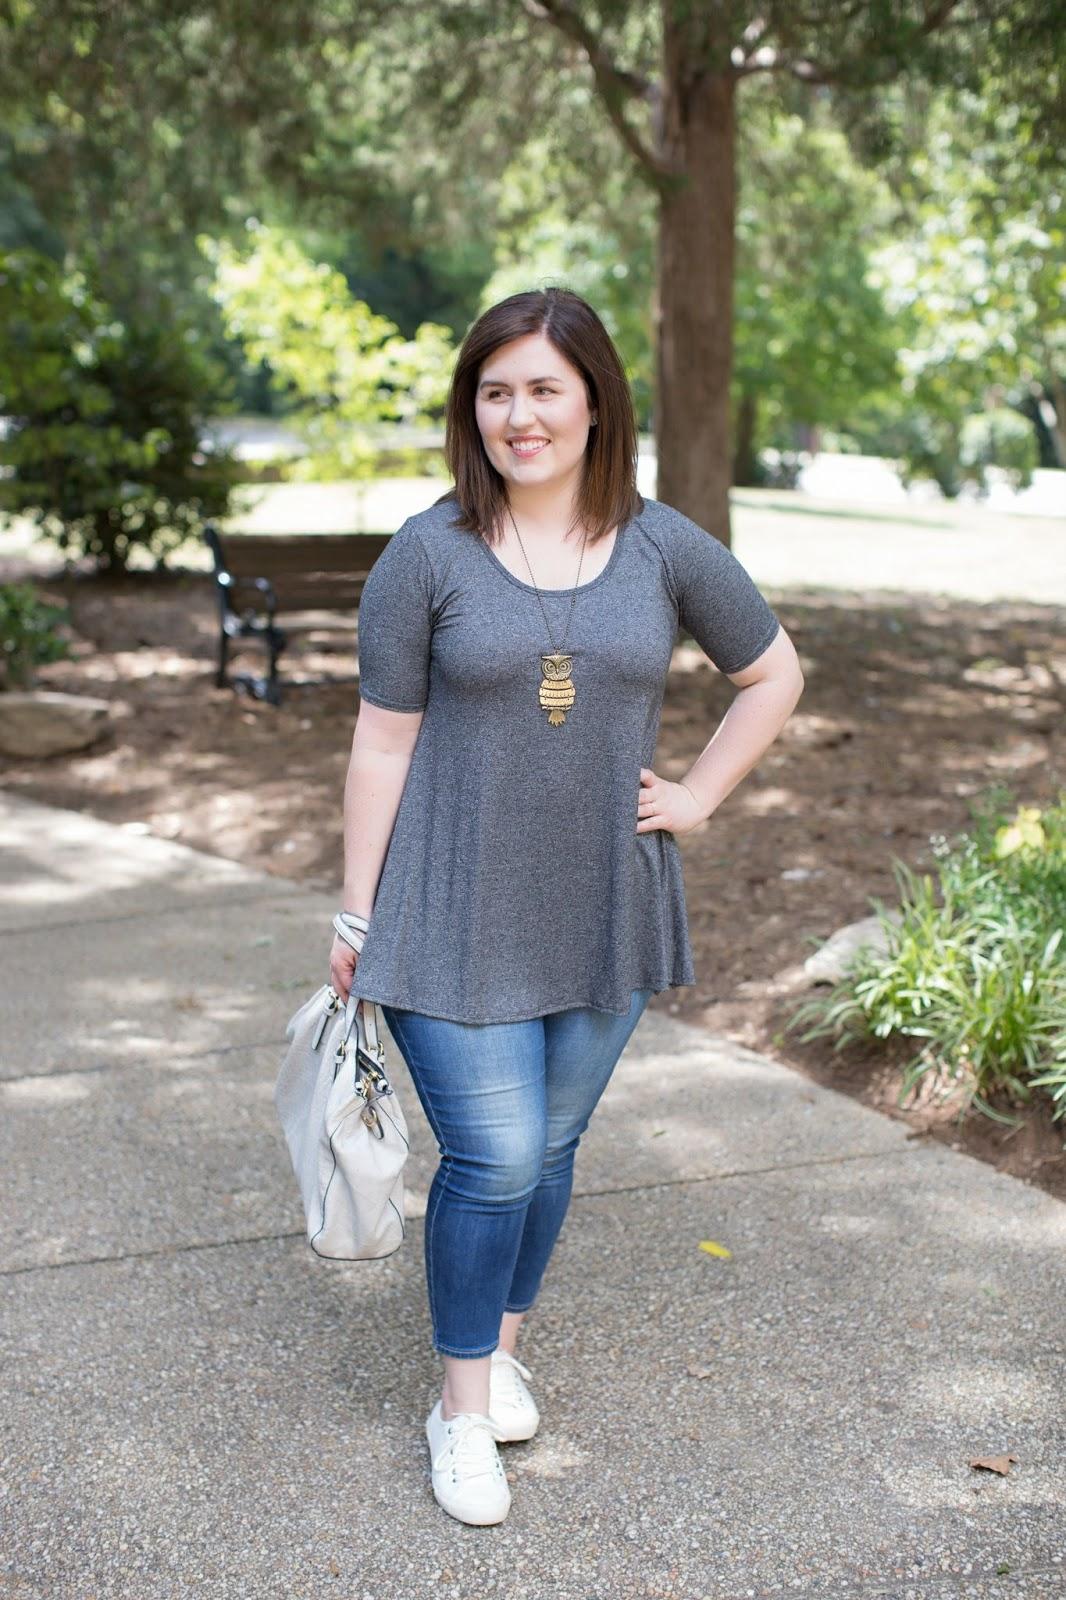 My Lularoe Perfect Tee by North Carolina style blogger Rebecca Lately